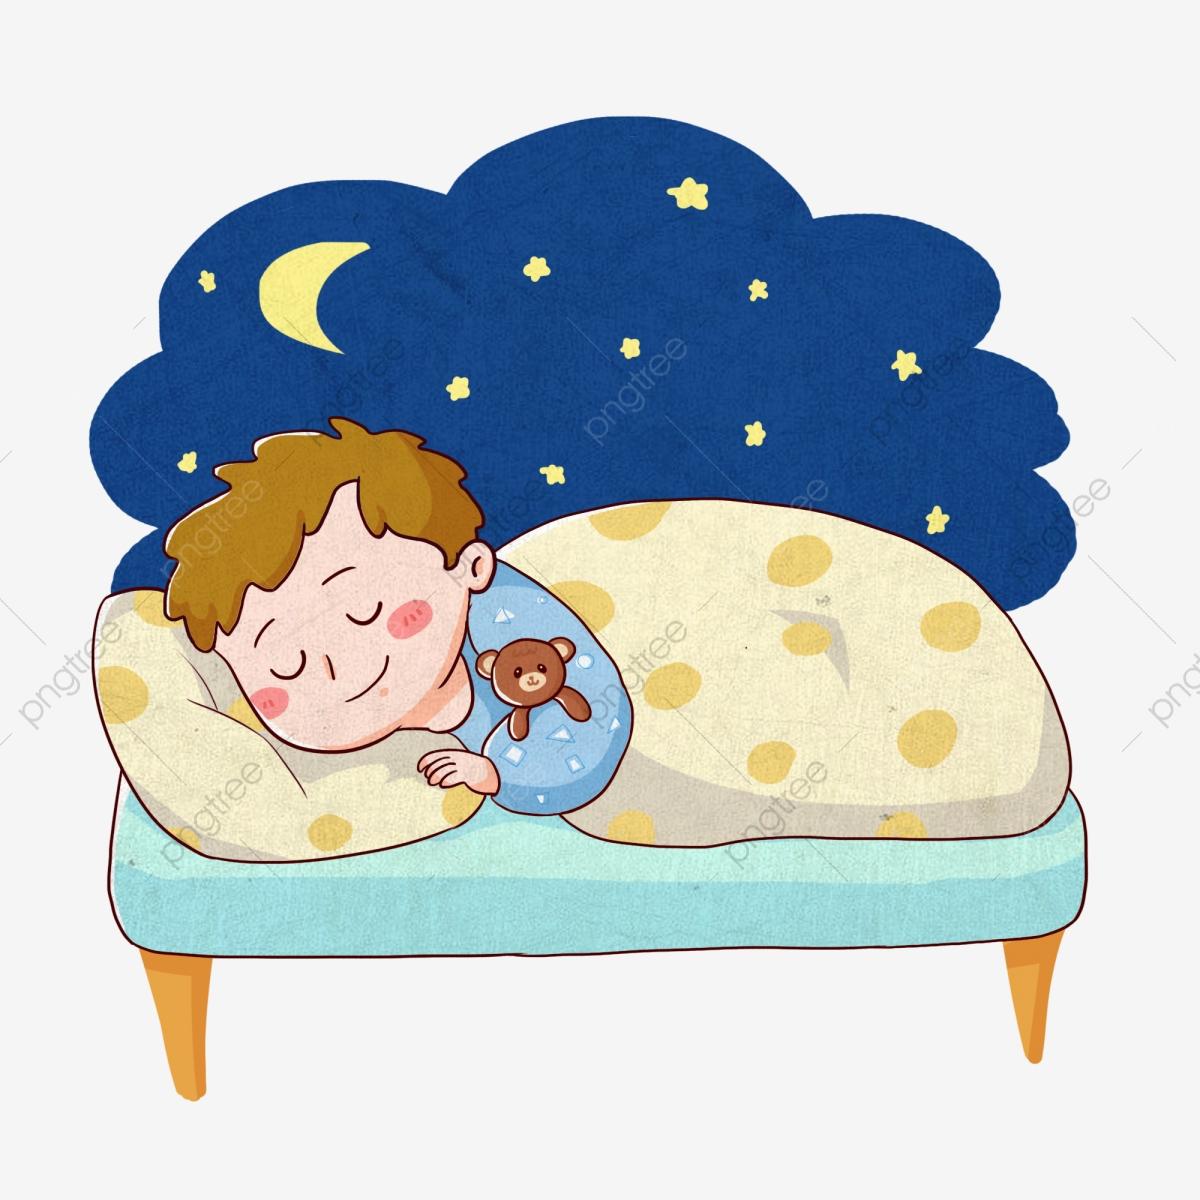 Night clipart nap. Moon sleep lovely hand